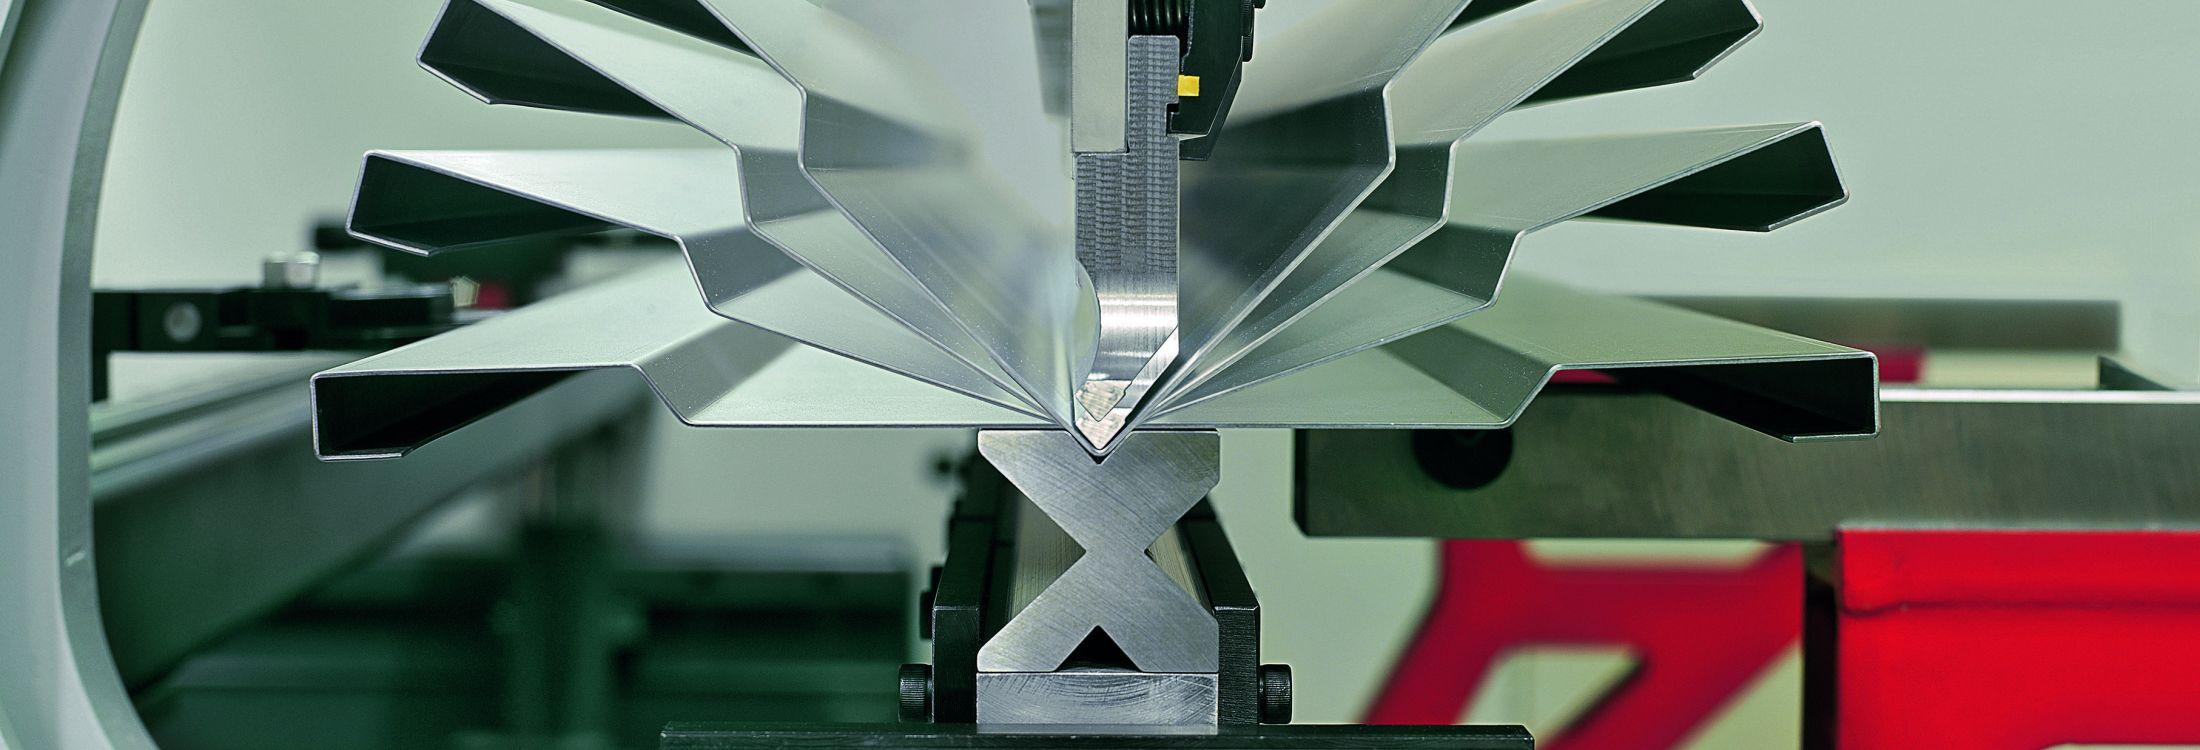 Sheet & Plate Working Machinery